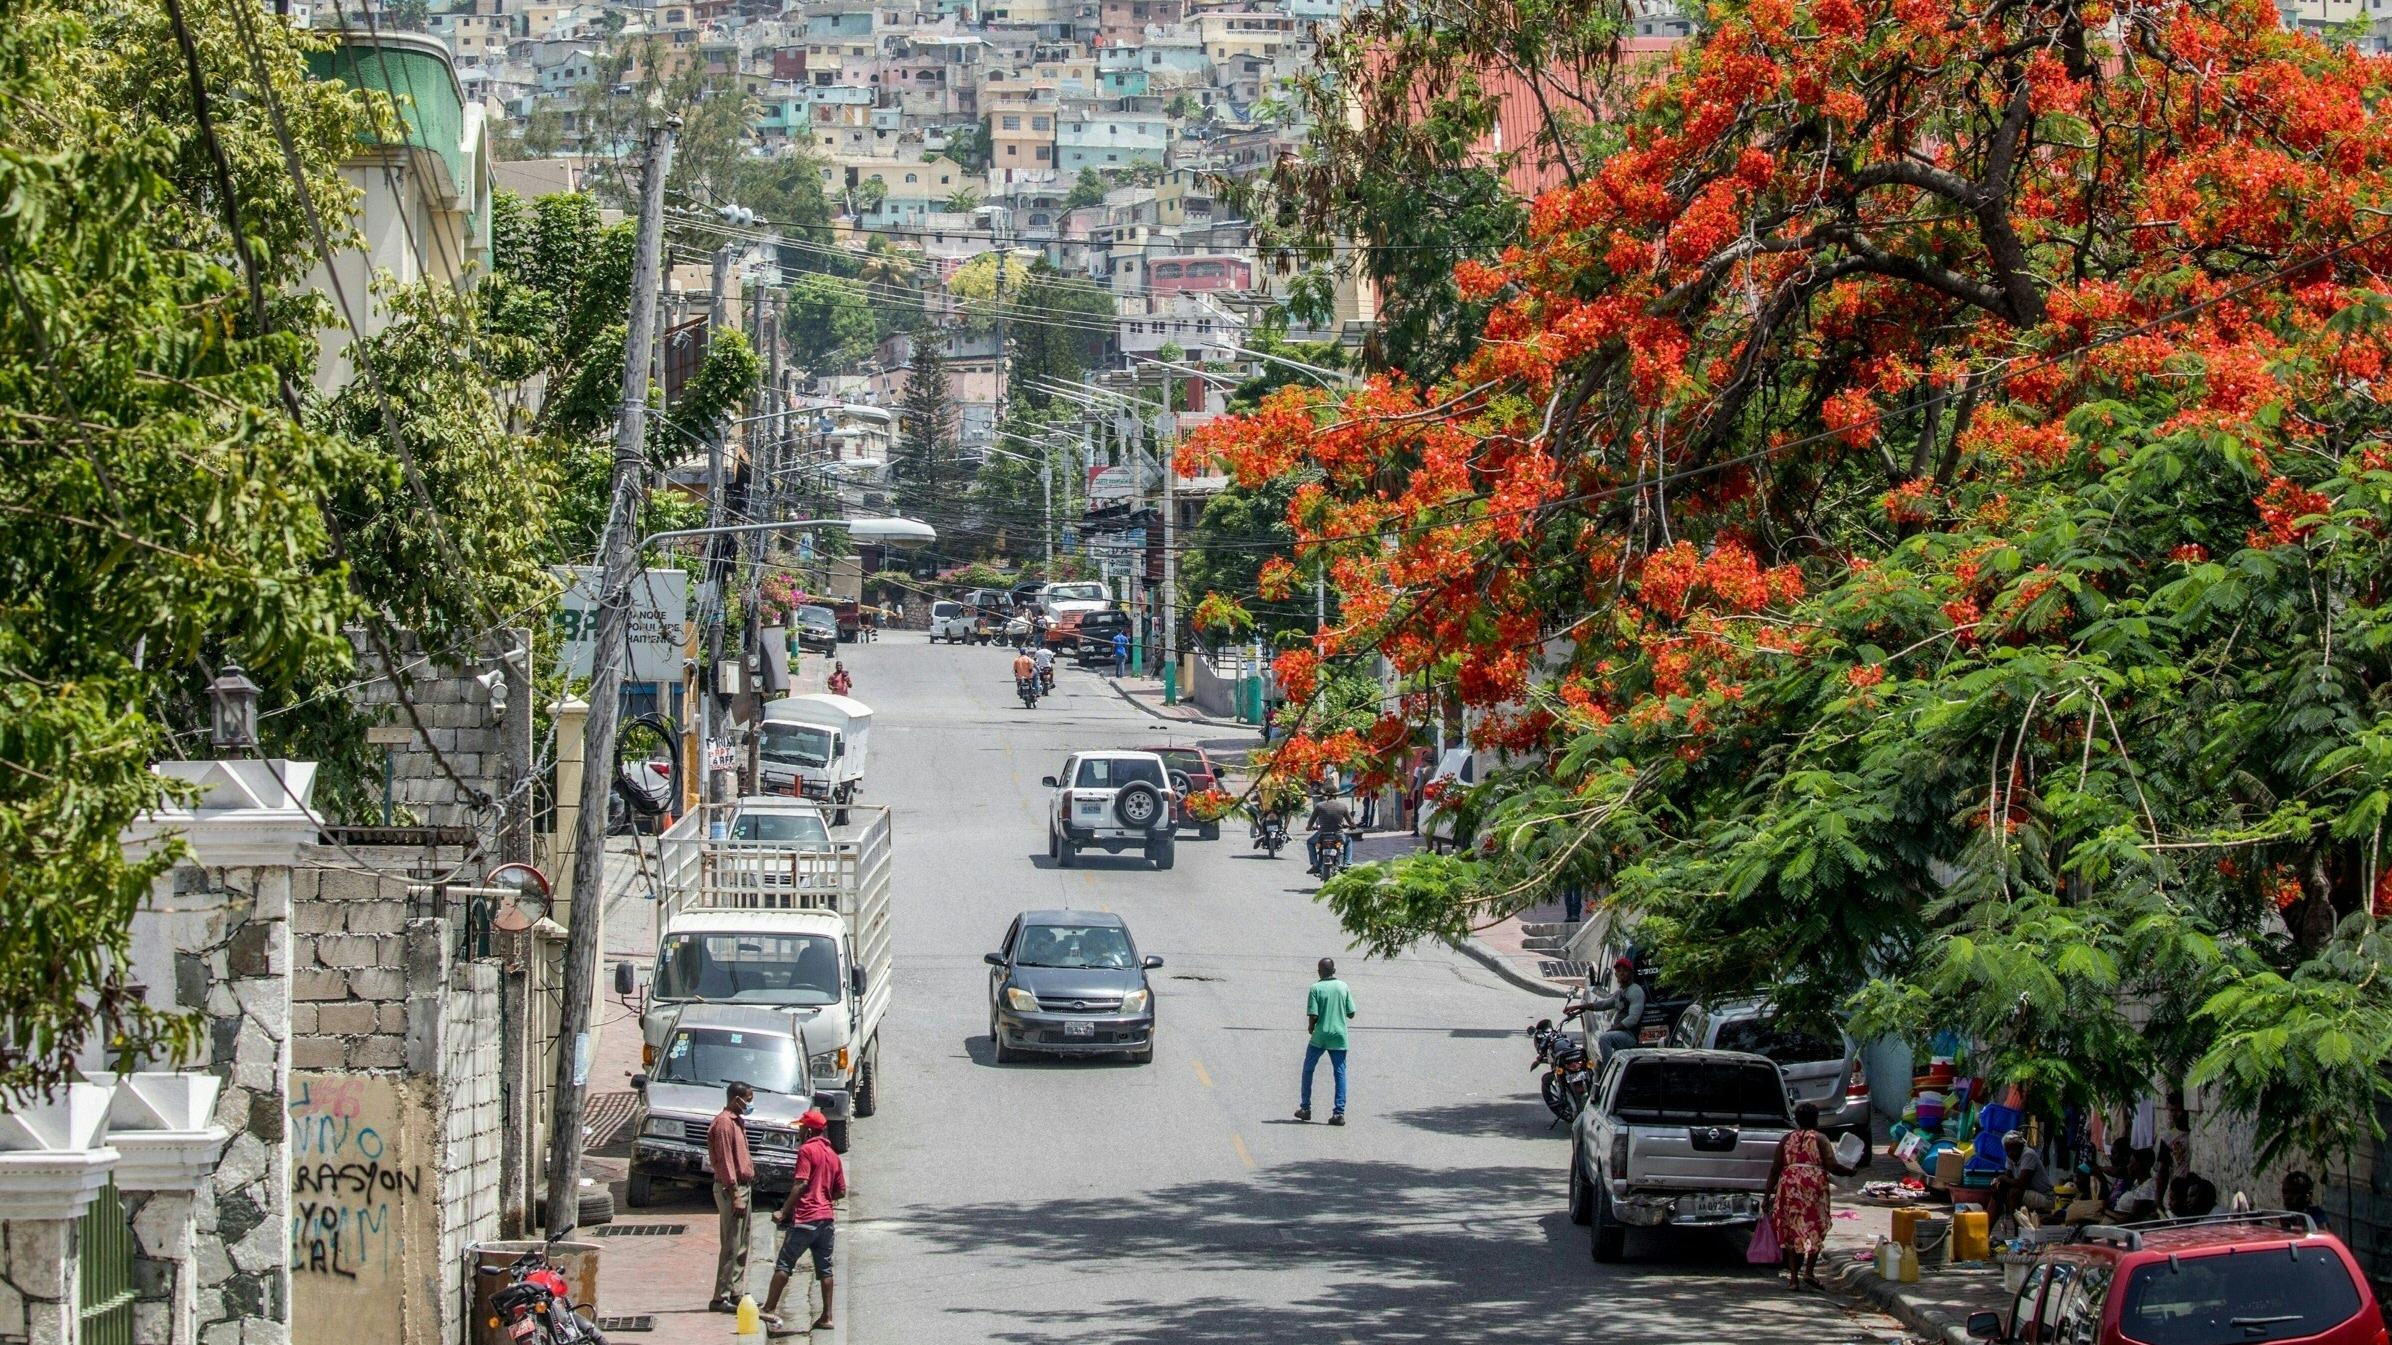 A street in Petionville, Port-au-Prince